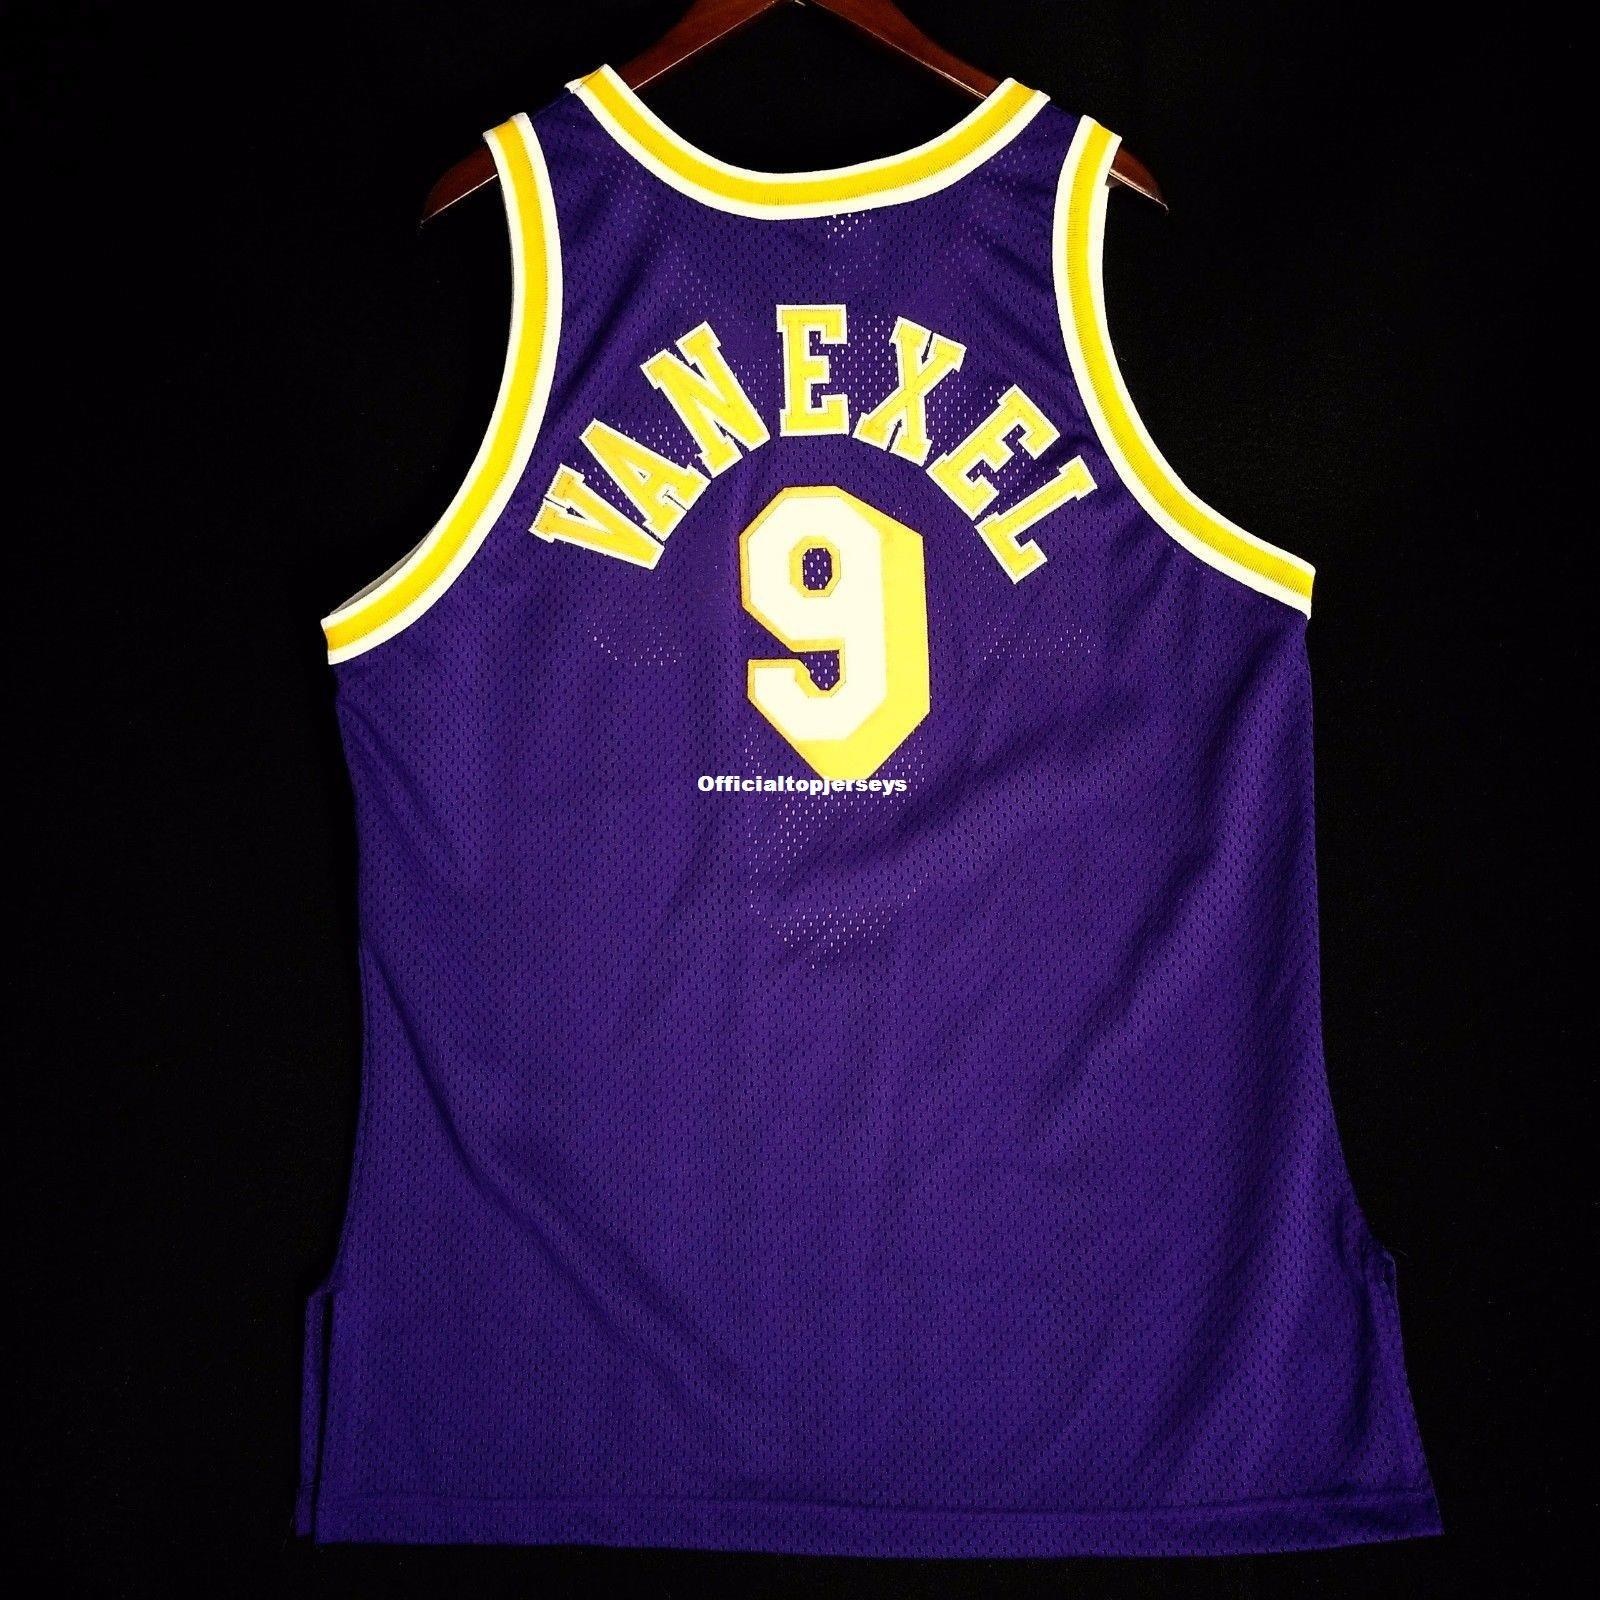 c184b23bf 2019 100% Stitched Nick Van Exel Champion Wholesale Jersey L Kobe Shaq Mens  Vest Size XS 6XL Stitched Basketball Jerseys Ncaa From Officialtopjerseys